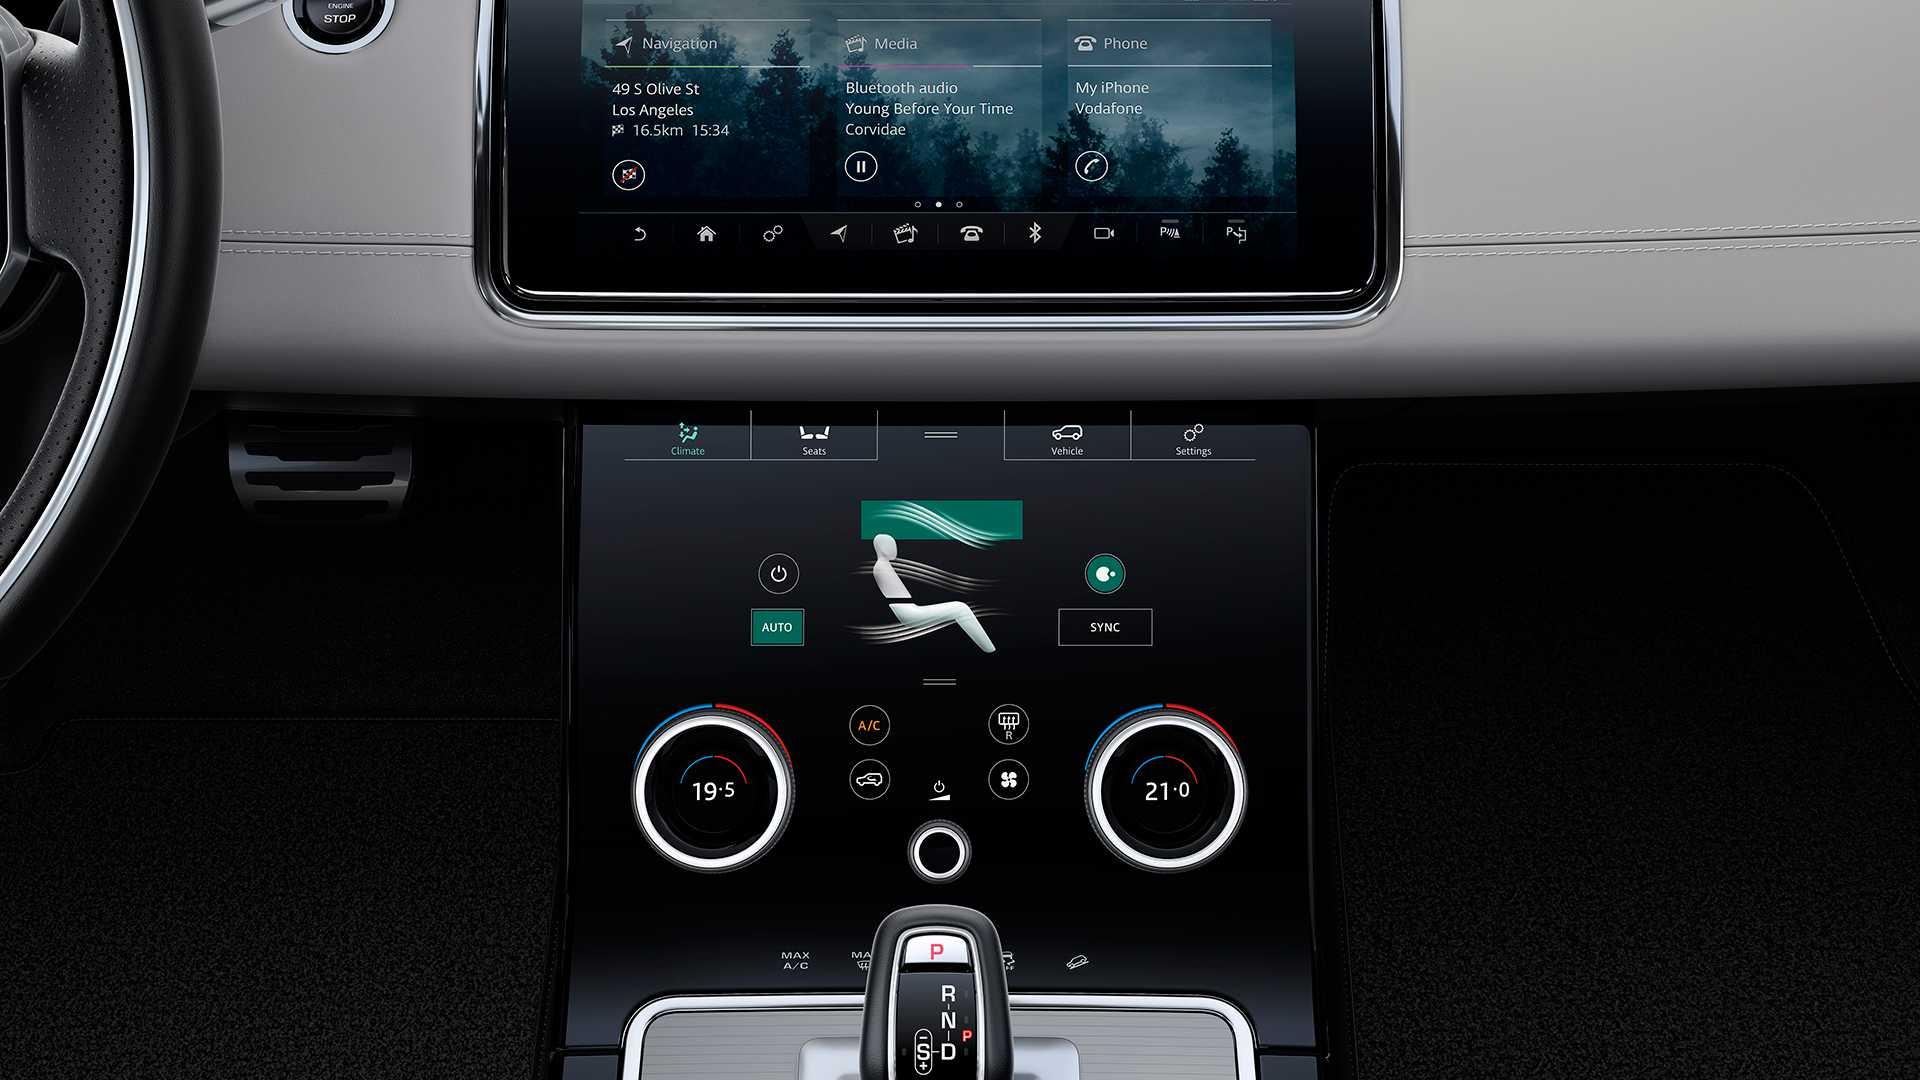 2020-range-rover-evoque (24)